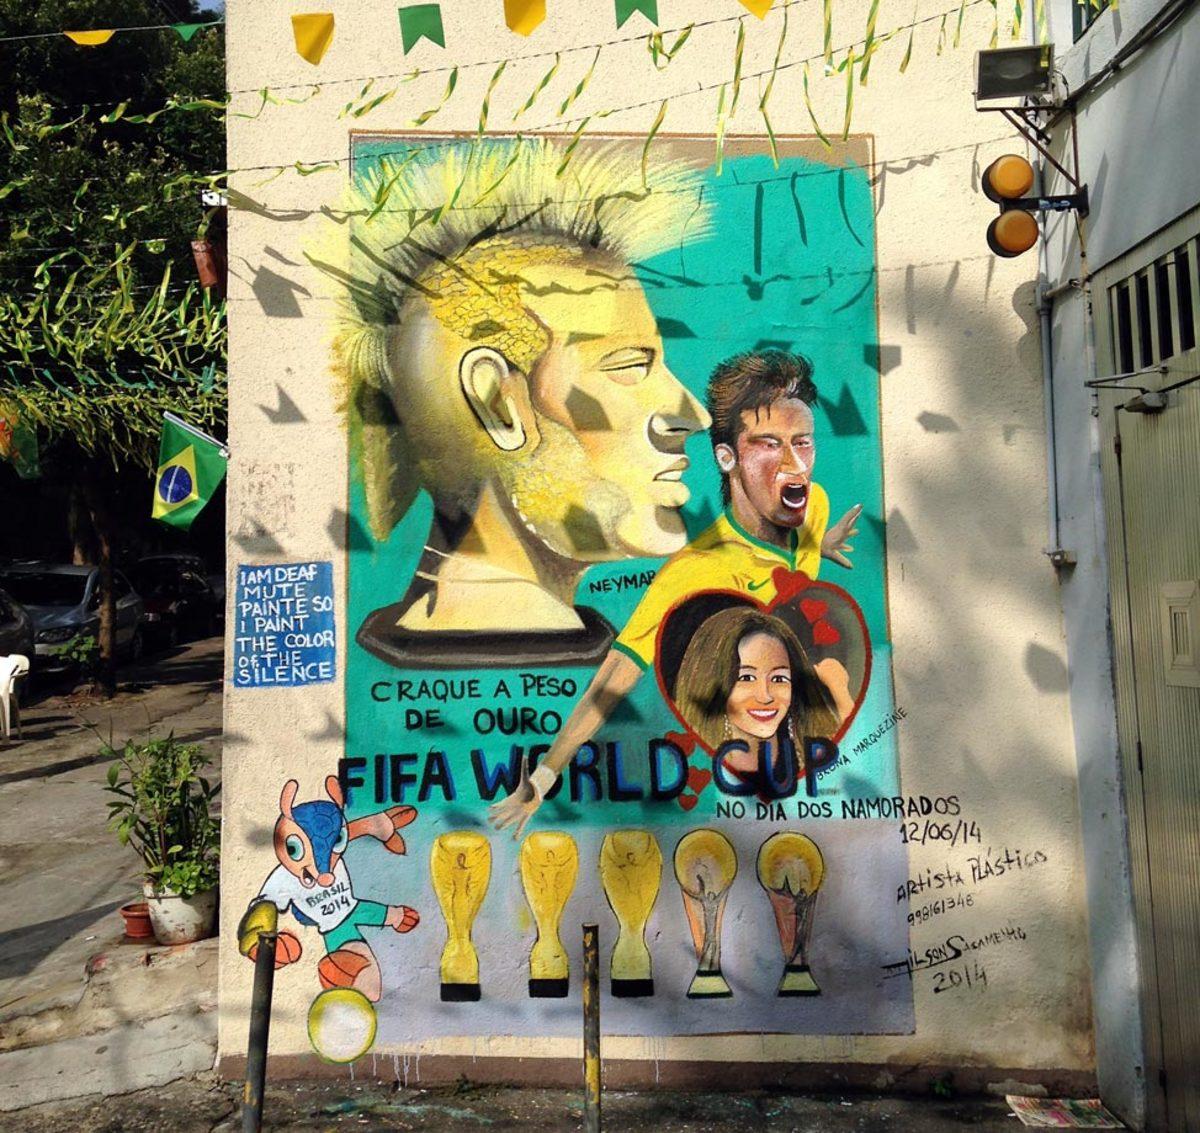 soccer-graffiti-mural-rio-IMG_8508.jpg